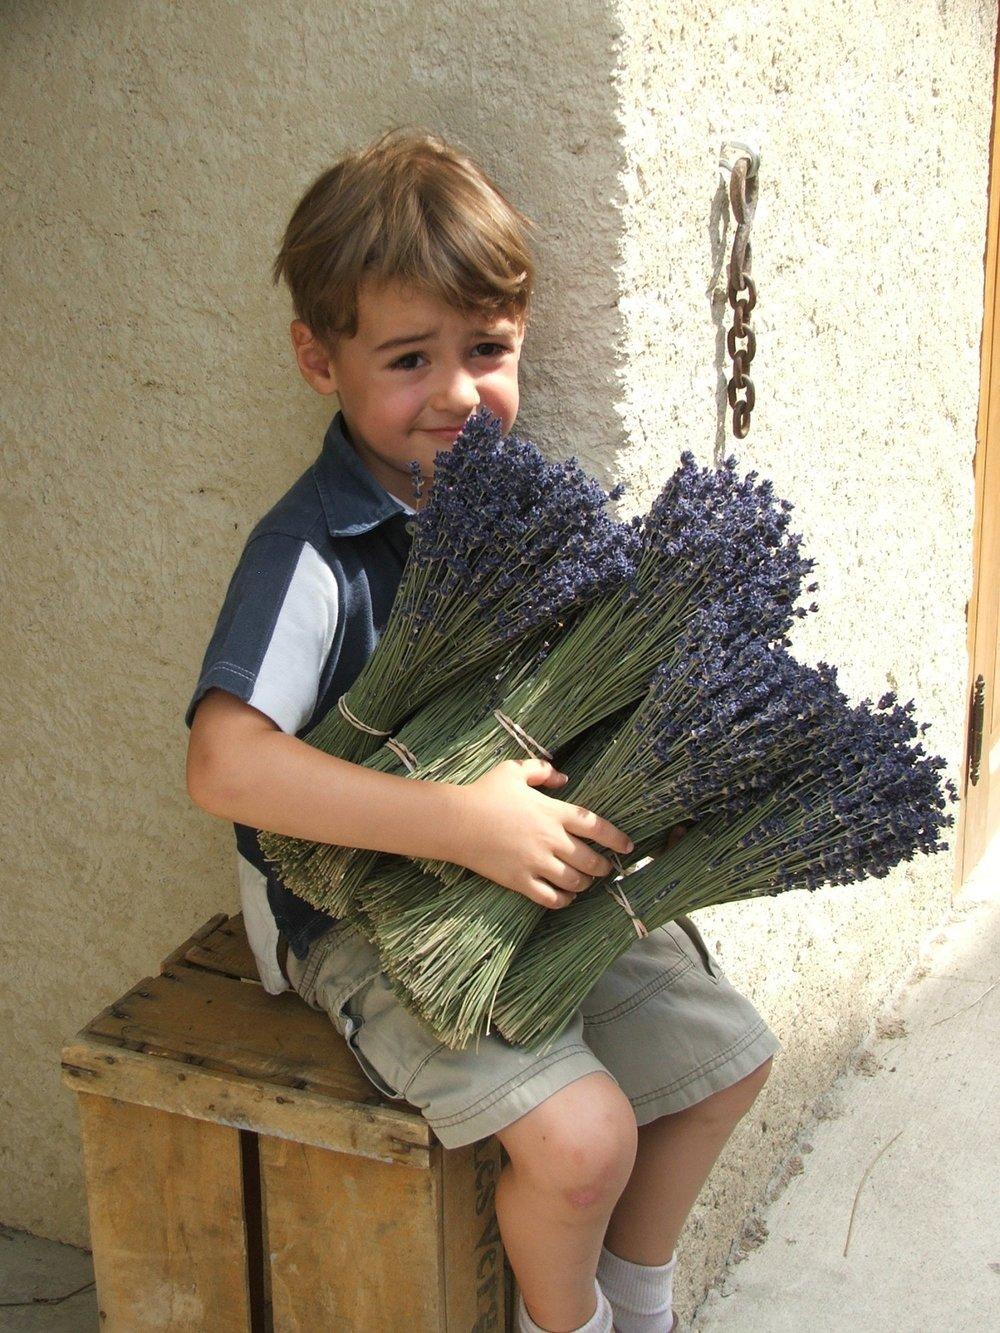 La Verriere Lavender collecting